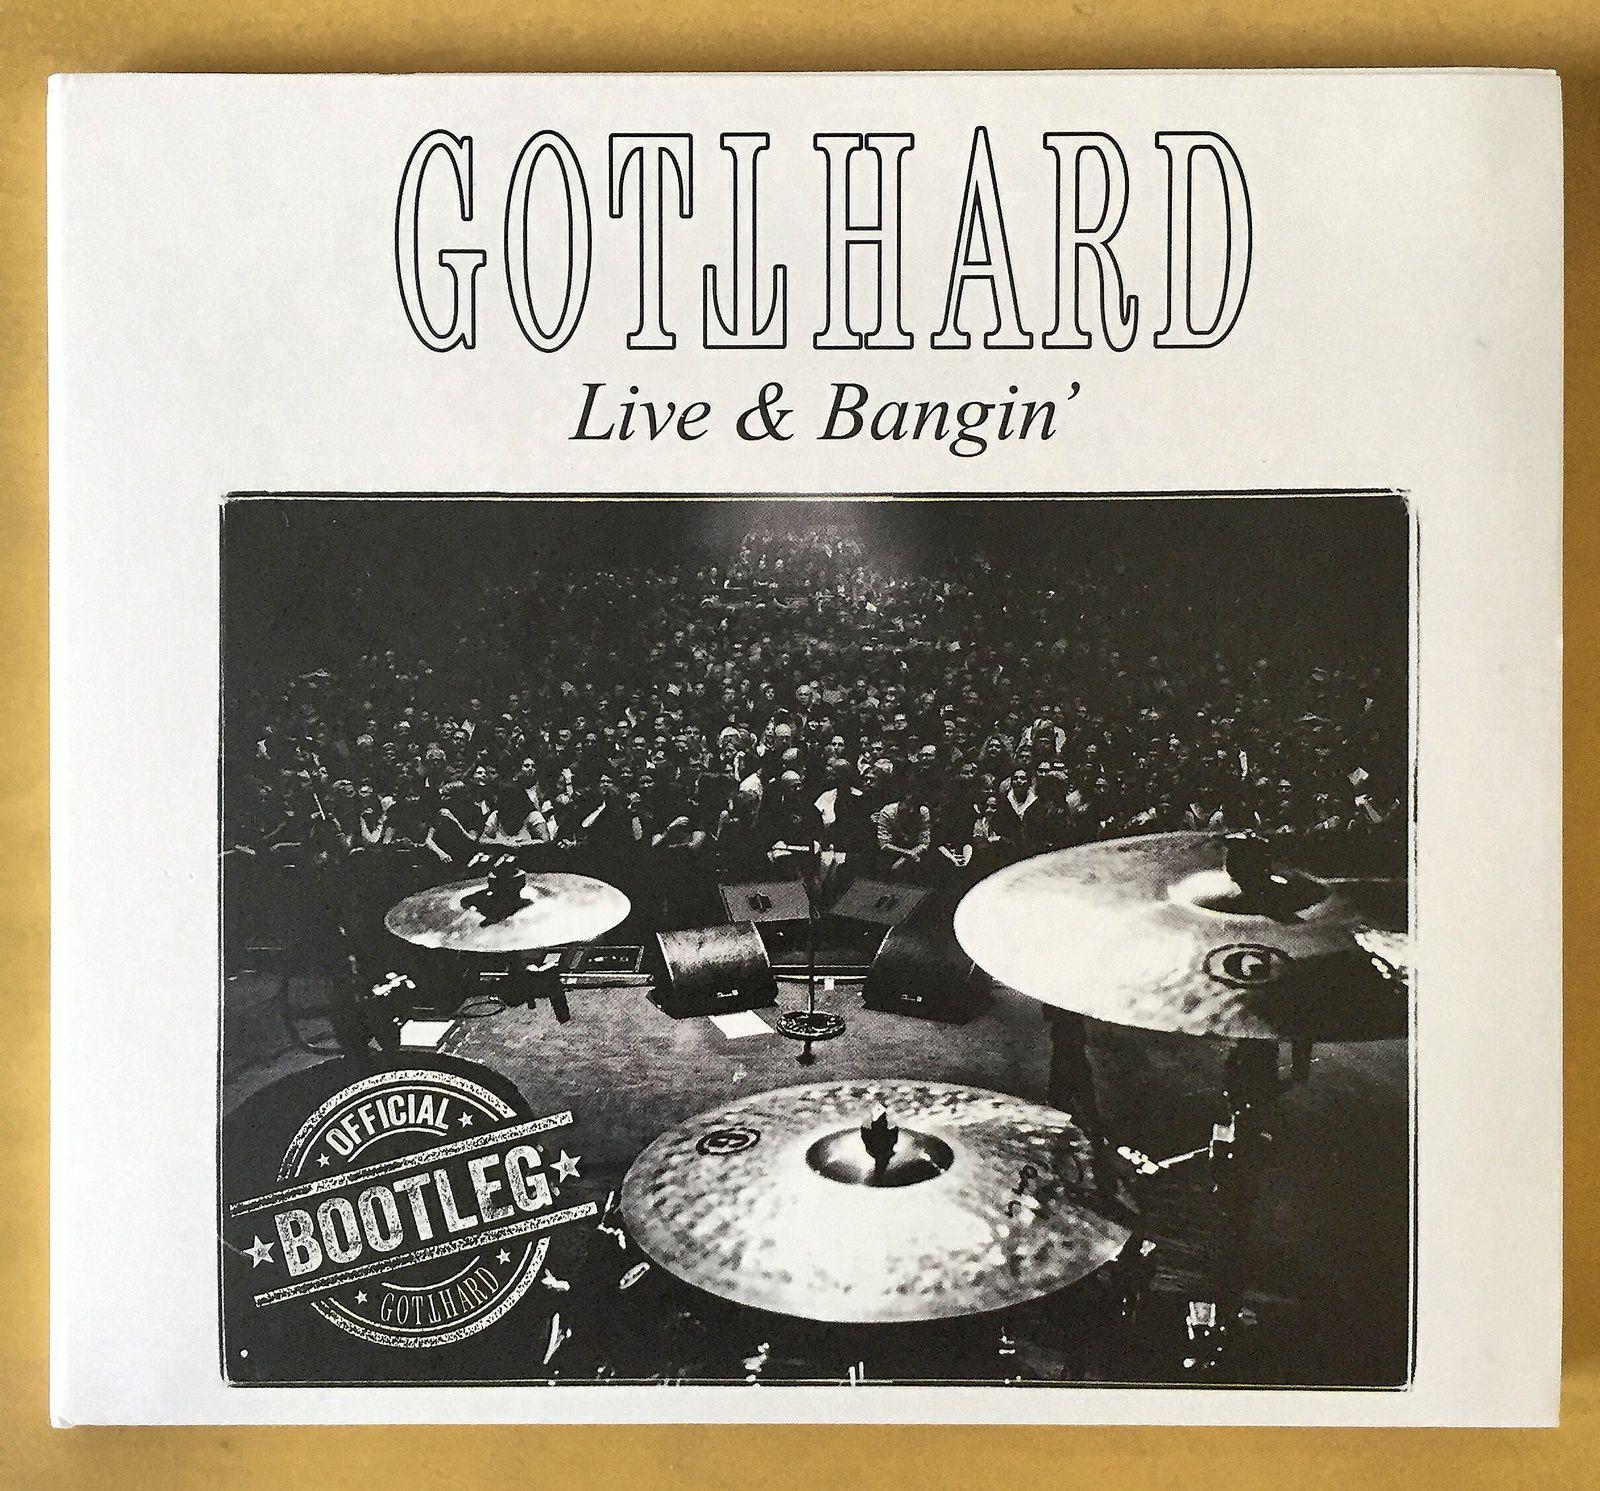 "CD review GOTTHARD ""Live & bangin'"""